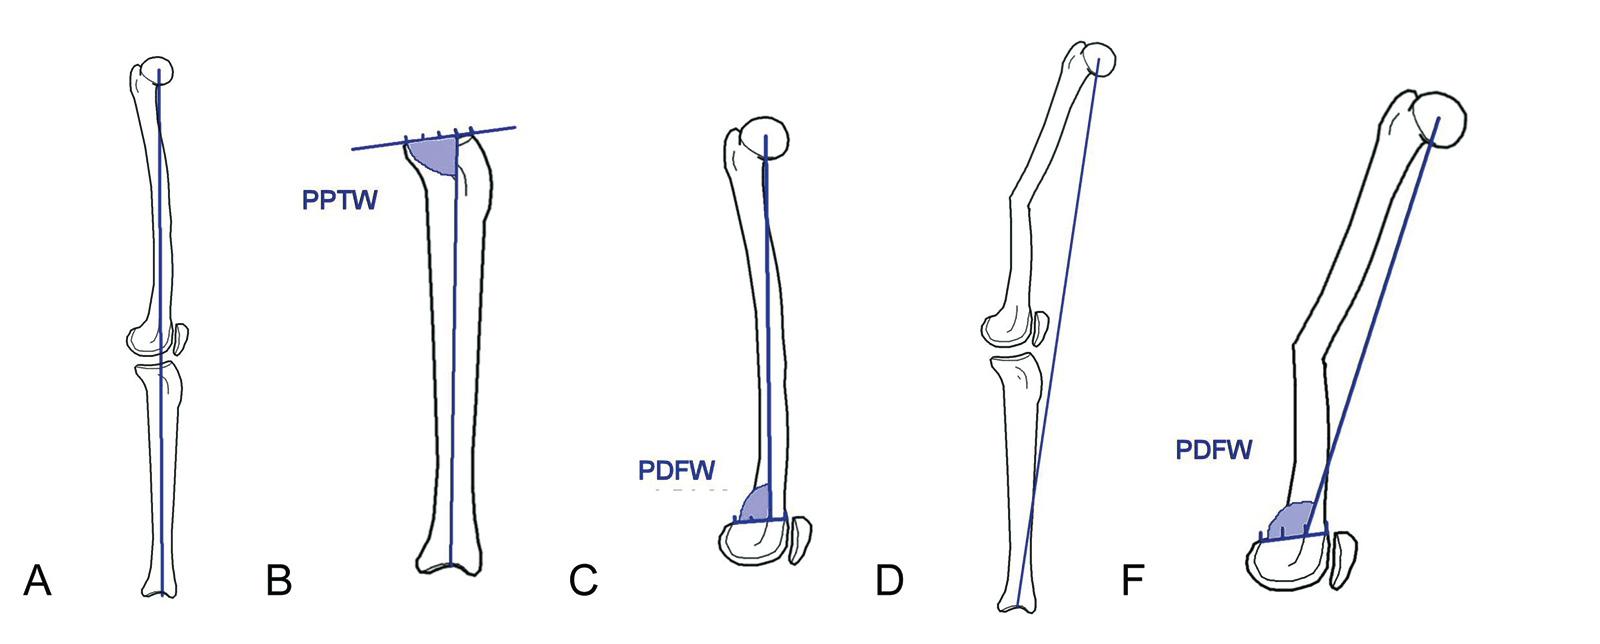 Abb. 4-42: Mechanische Achse in voller Streckung (A), posteriorer proximaler Tibiawinkel (B), posteriorer distaler Femurwinkel (C), mechanische Achse bei einer Femurdeformität (D), posteriorer distaler Femurwinkel bei einer Femurdeformität (F)